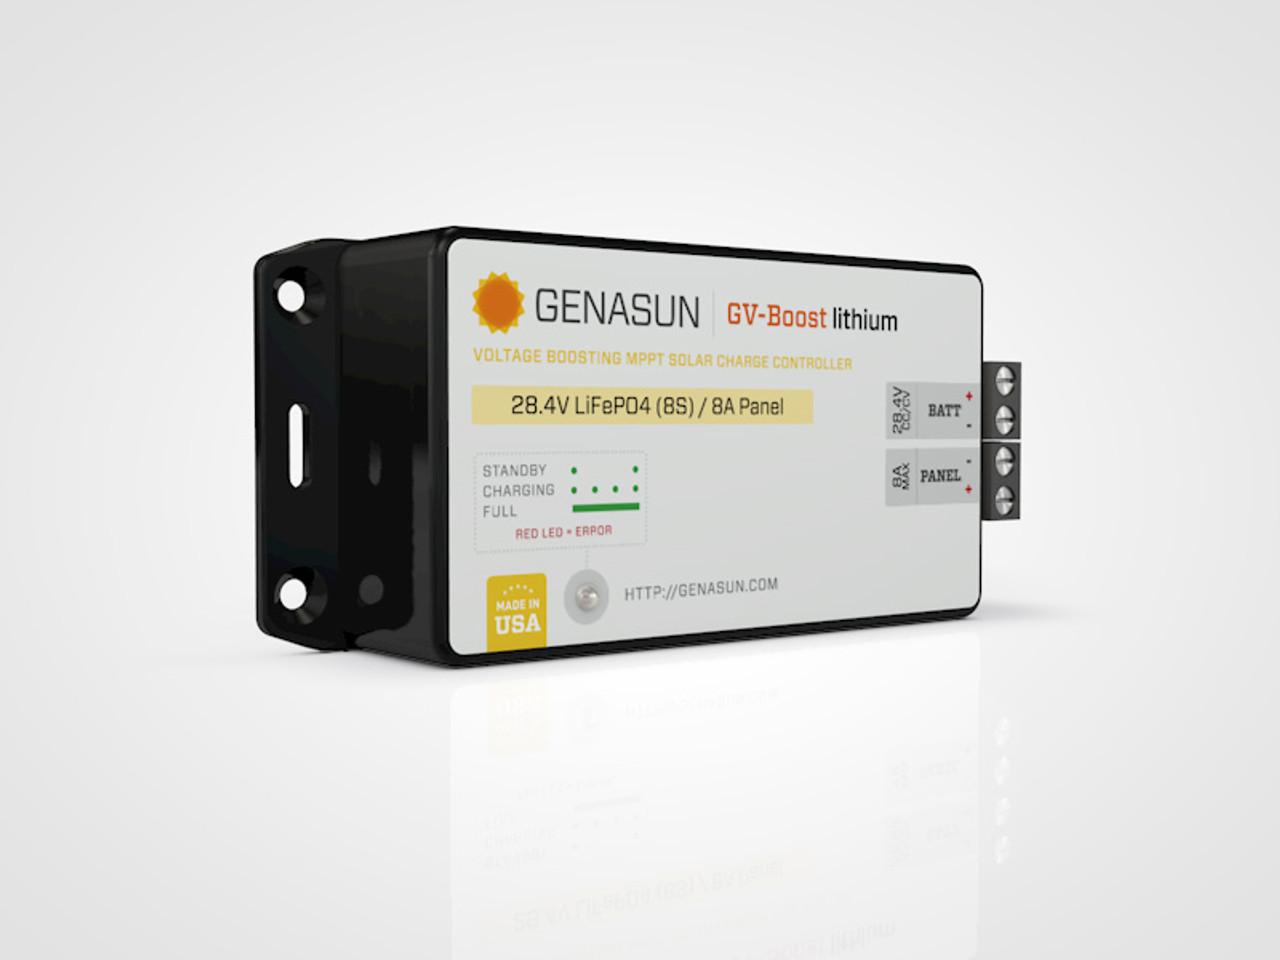 GVB-8 | 105W 8A 12V Genasun MPPT Boost Solar Charge Controller - Li - Left2